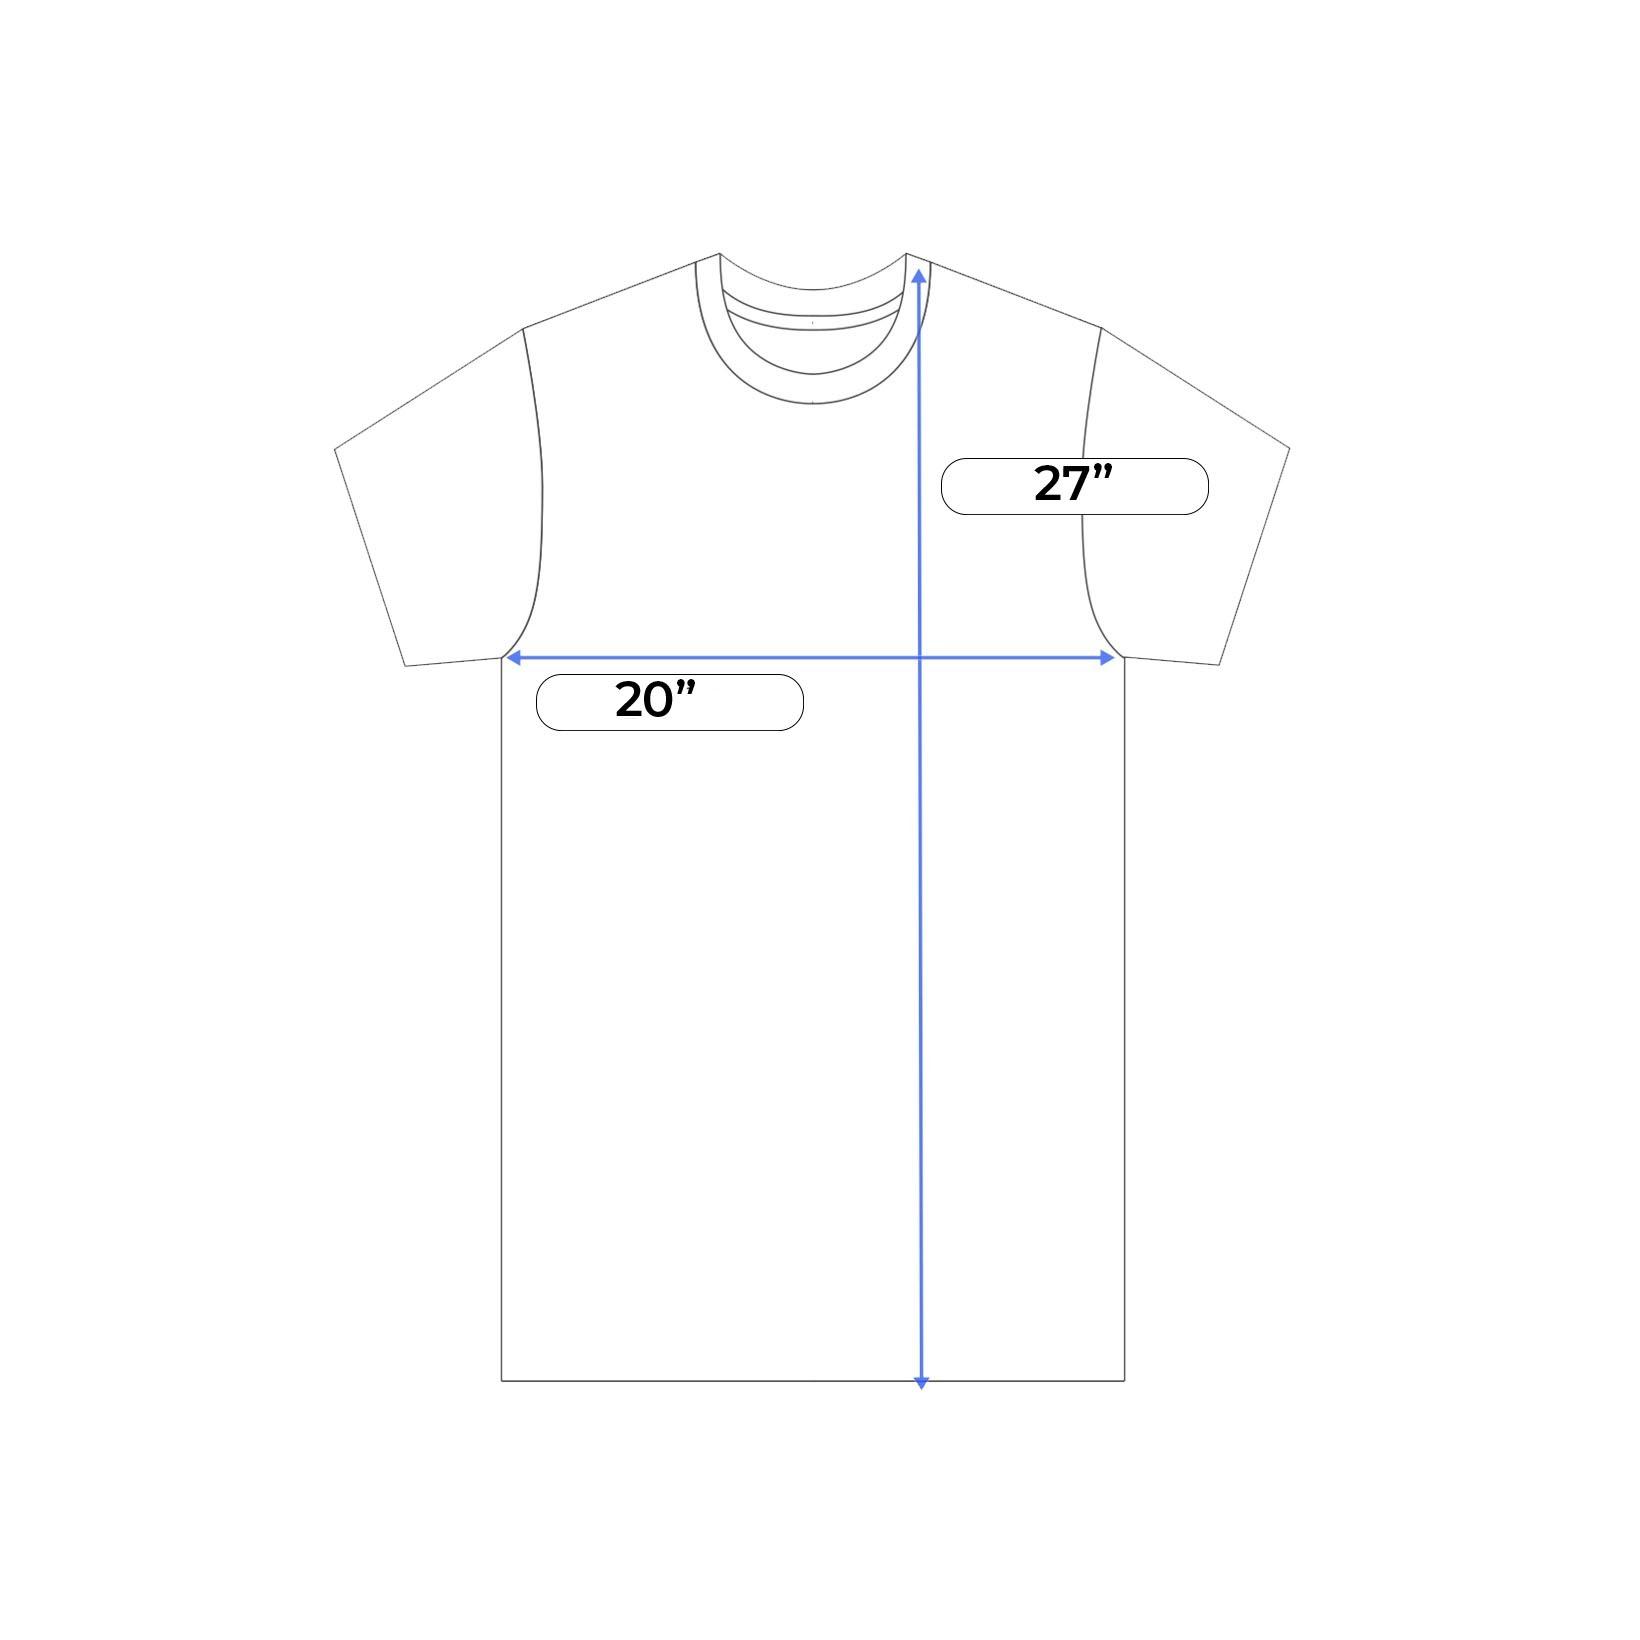 size-shirt2.jpg